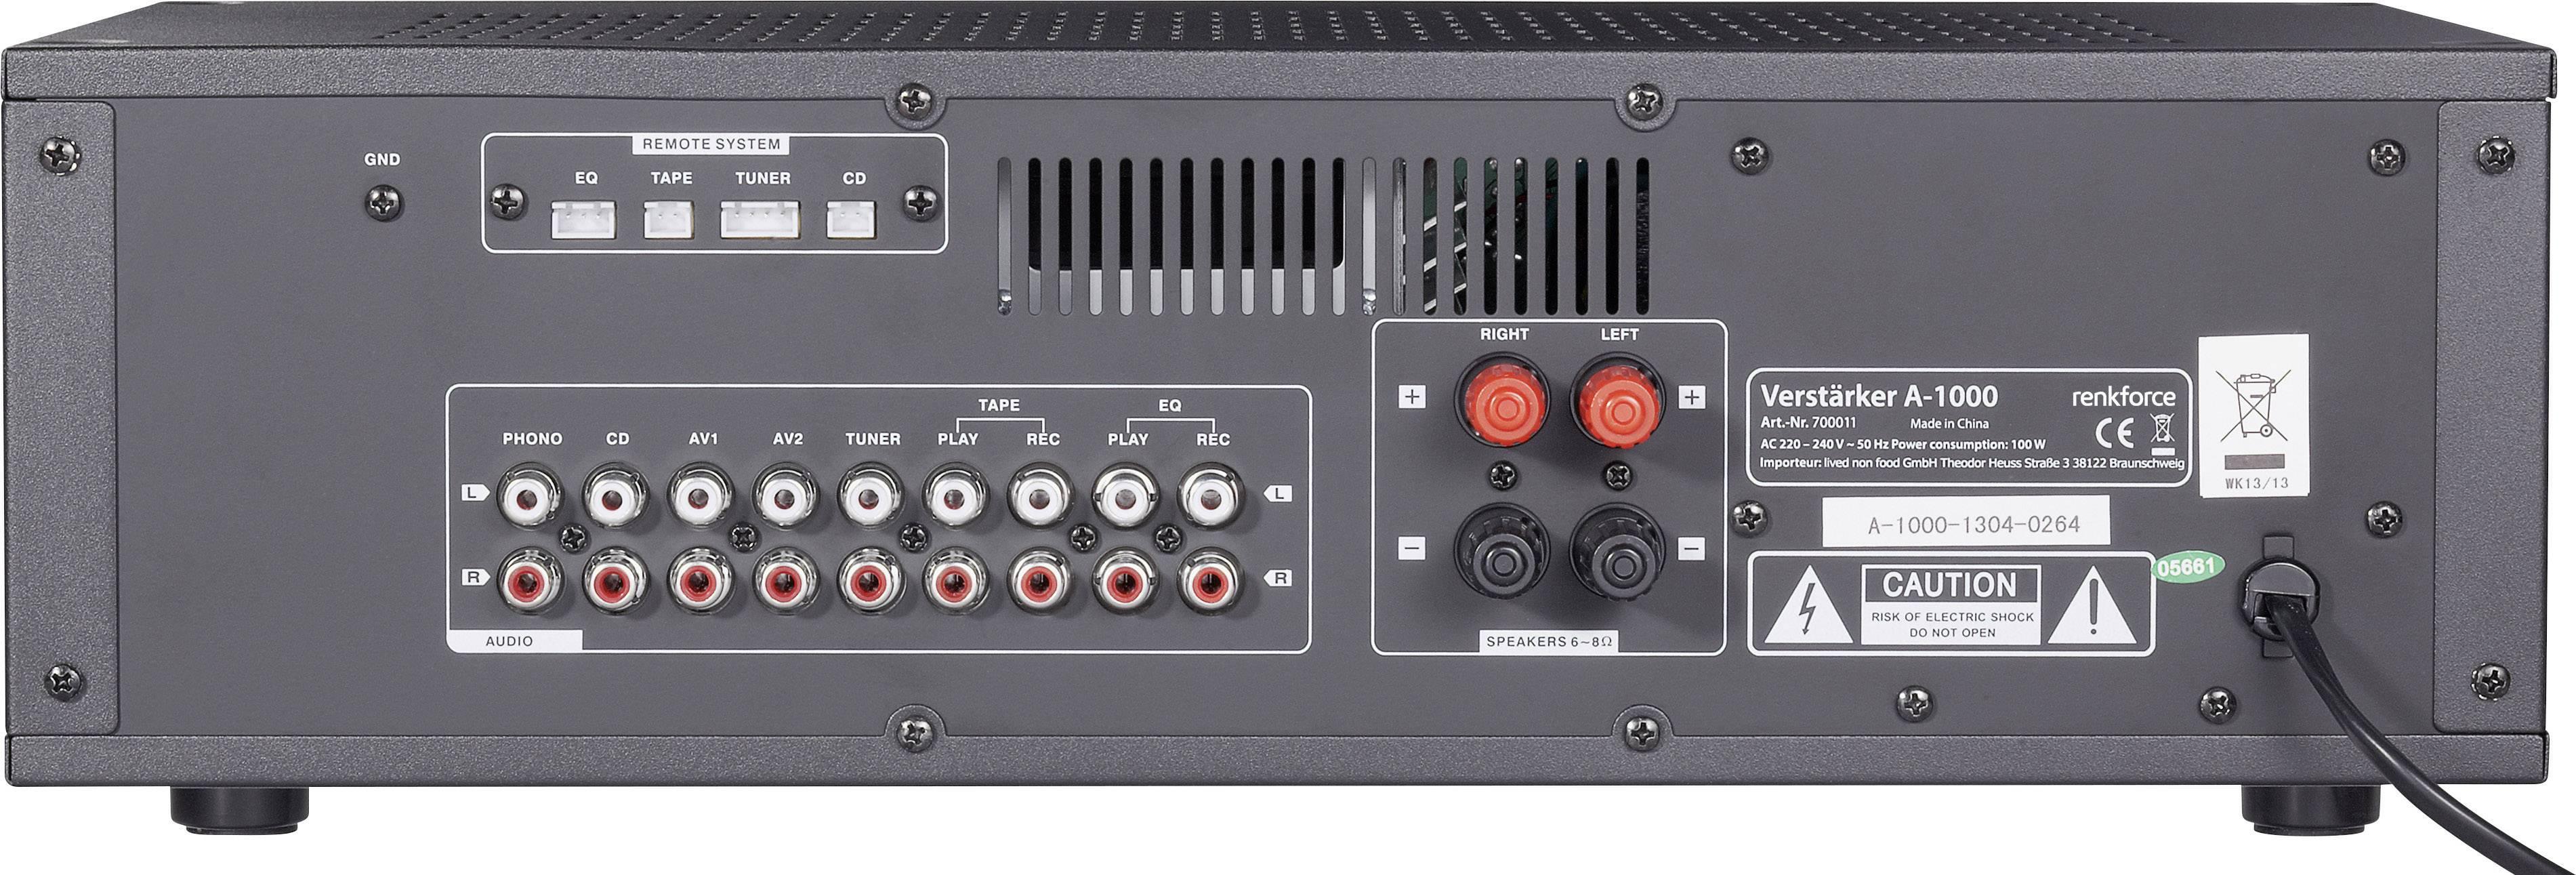 Zesilovač Renkforce A-1000, 2x 50 W